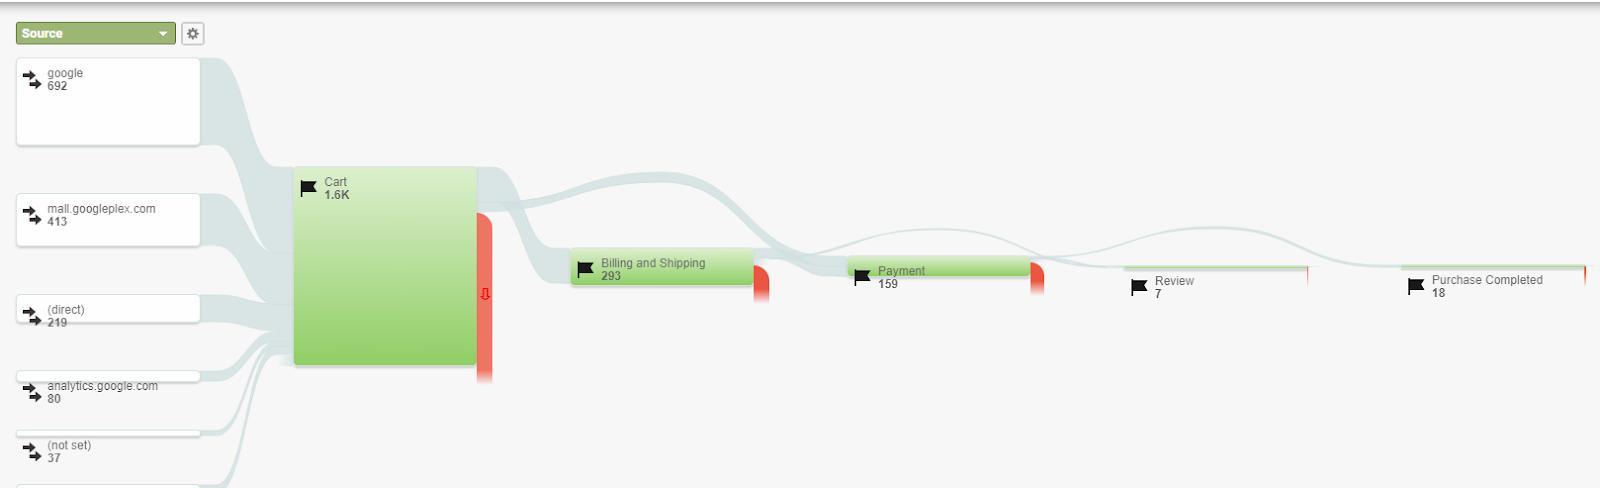 Funnel flow in Google Analytics